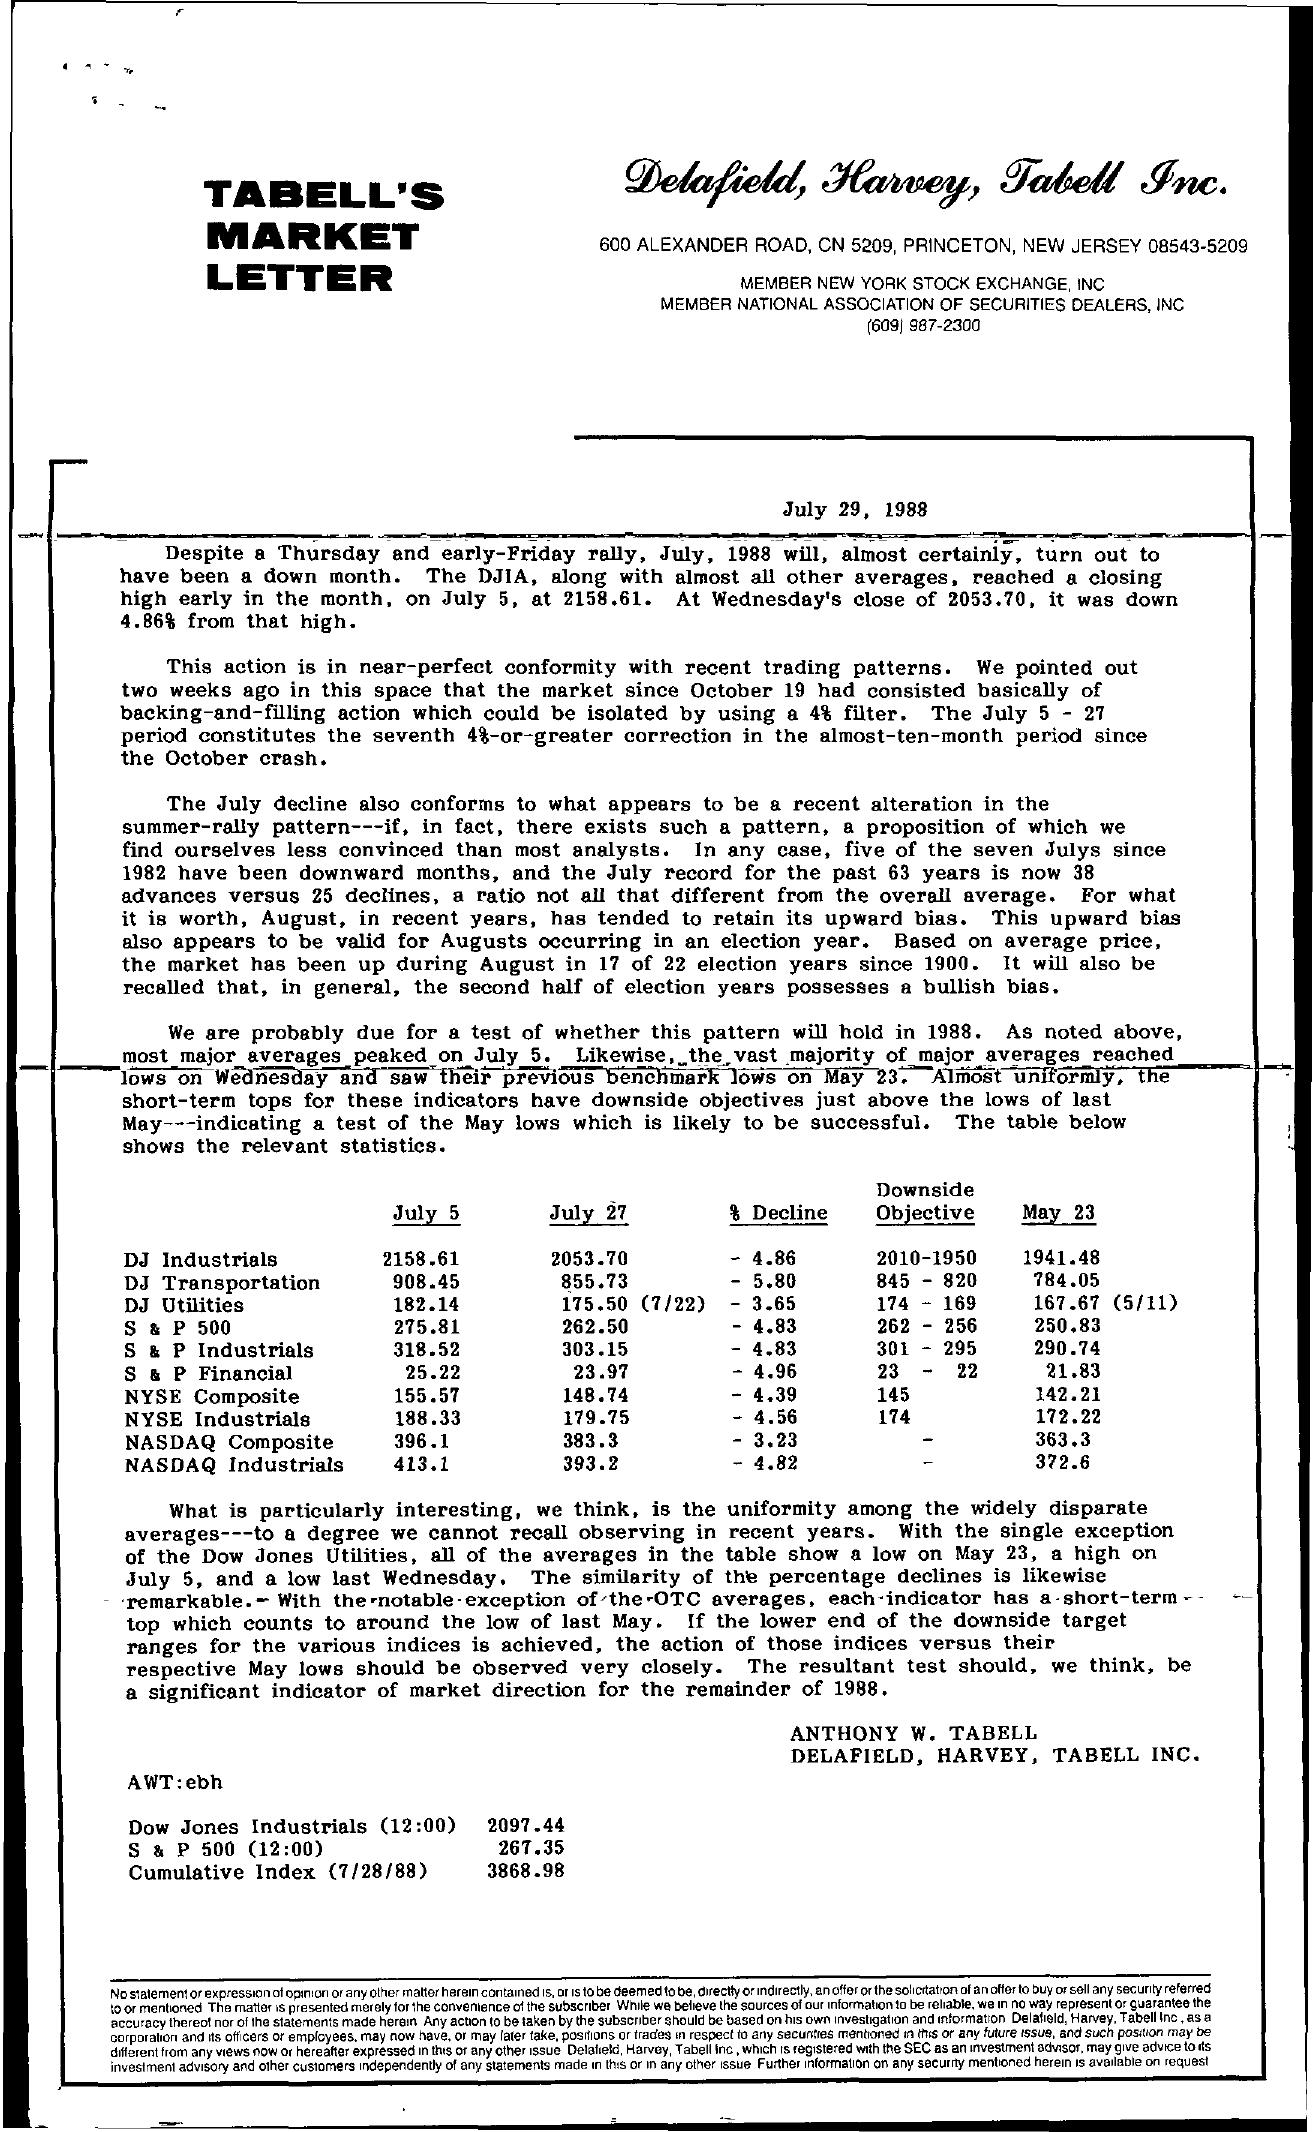 Tabell's Market Letter - July 29, 1988